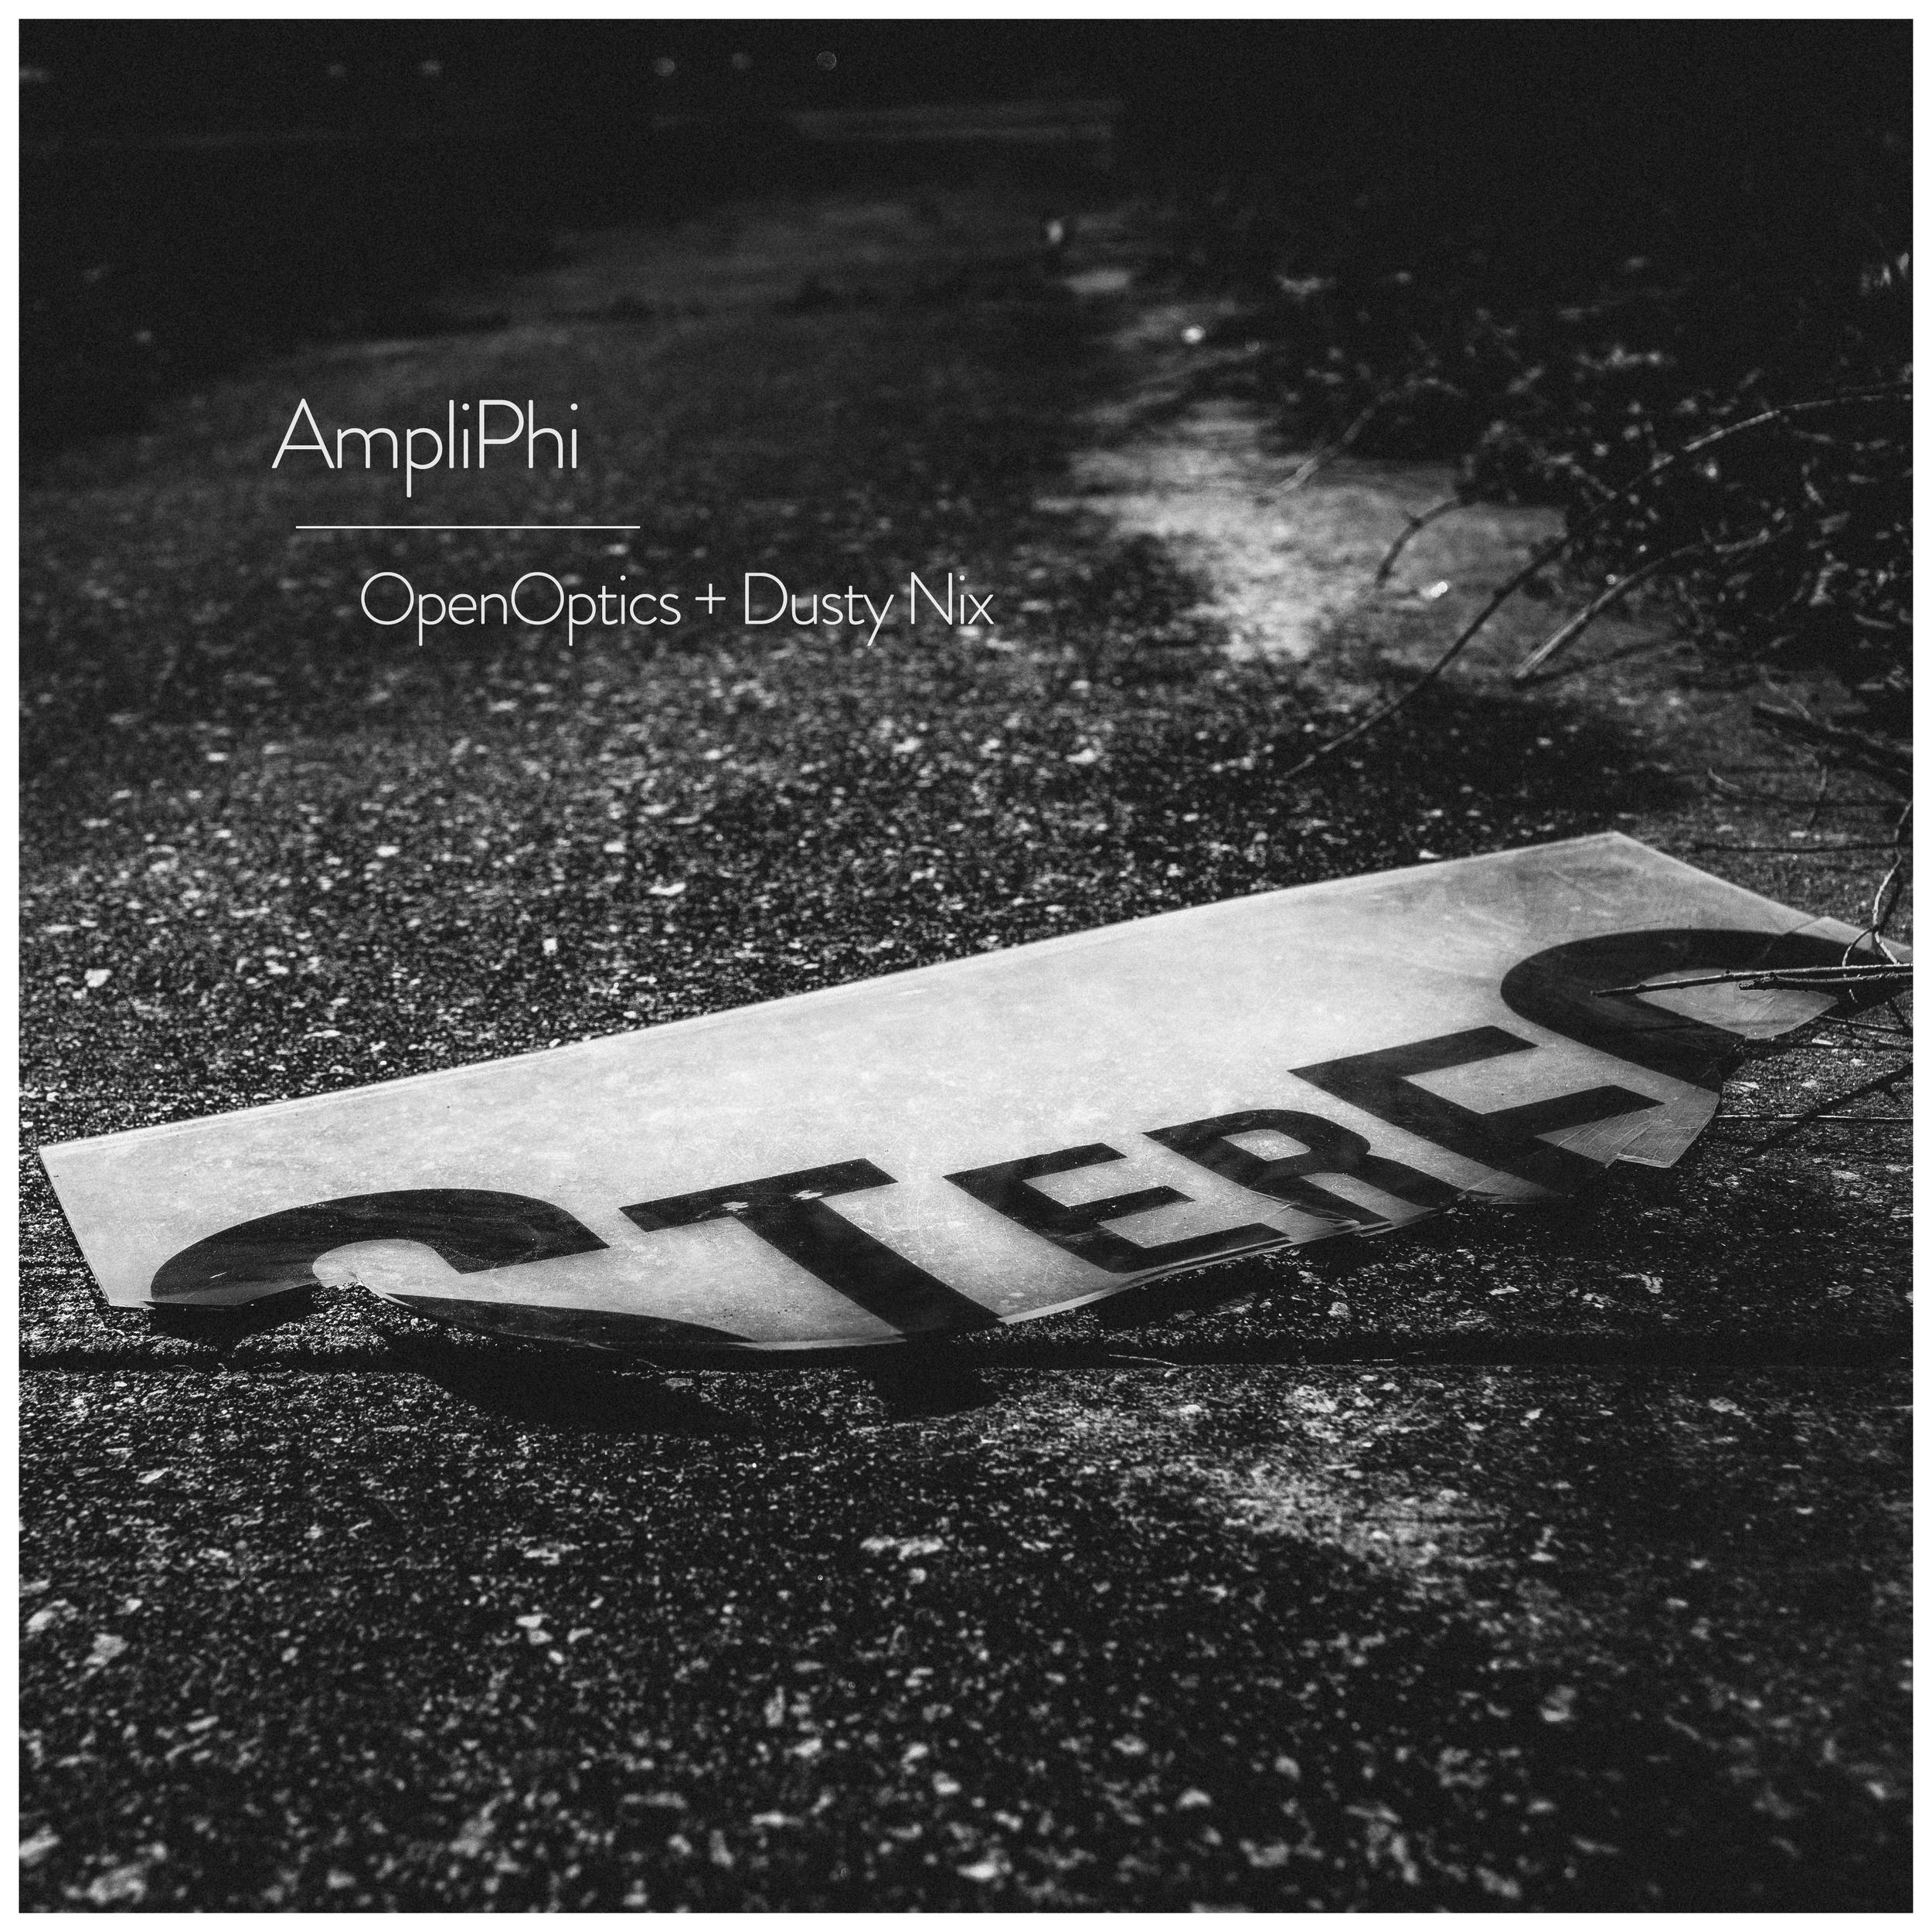 ampliphi+info2.jpg